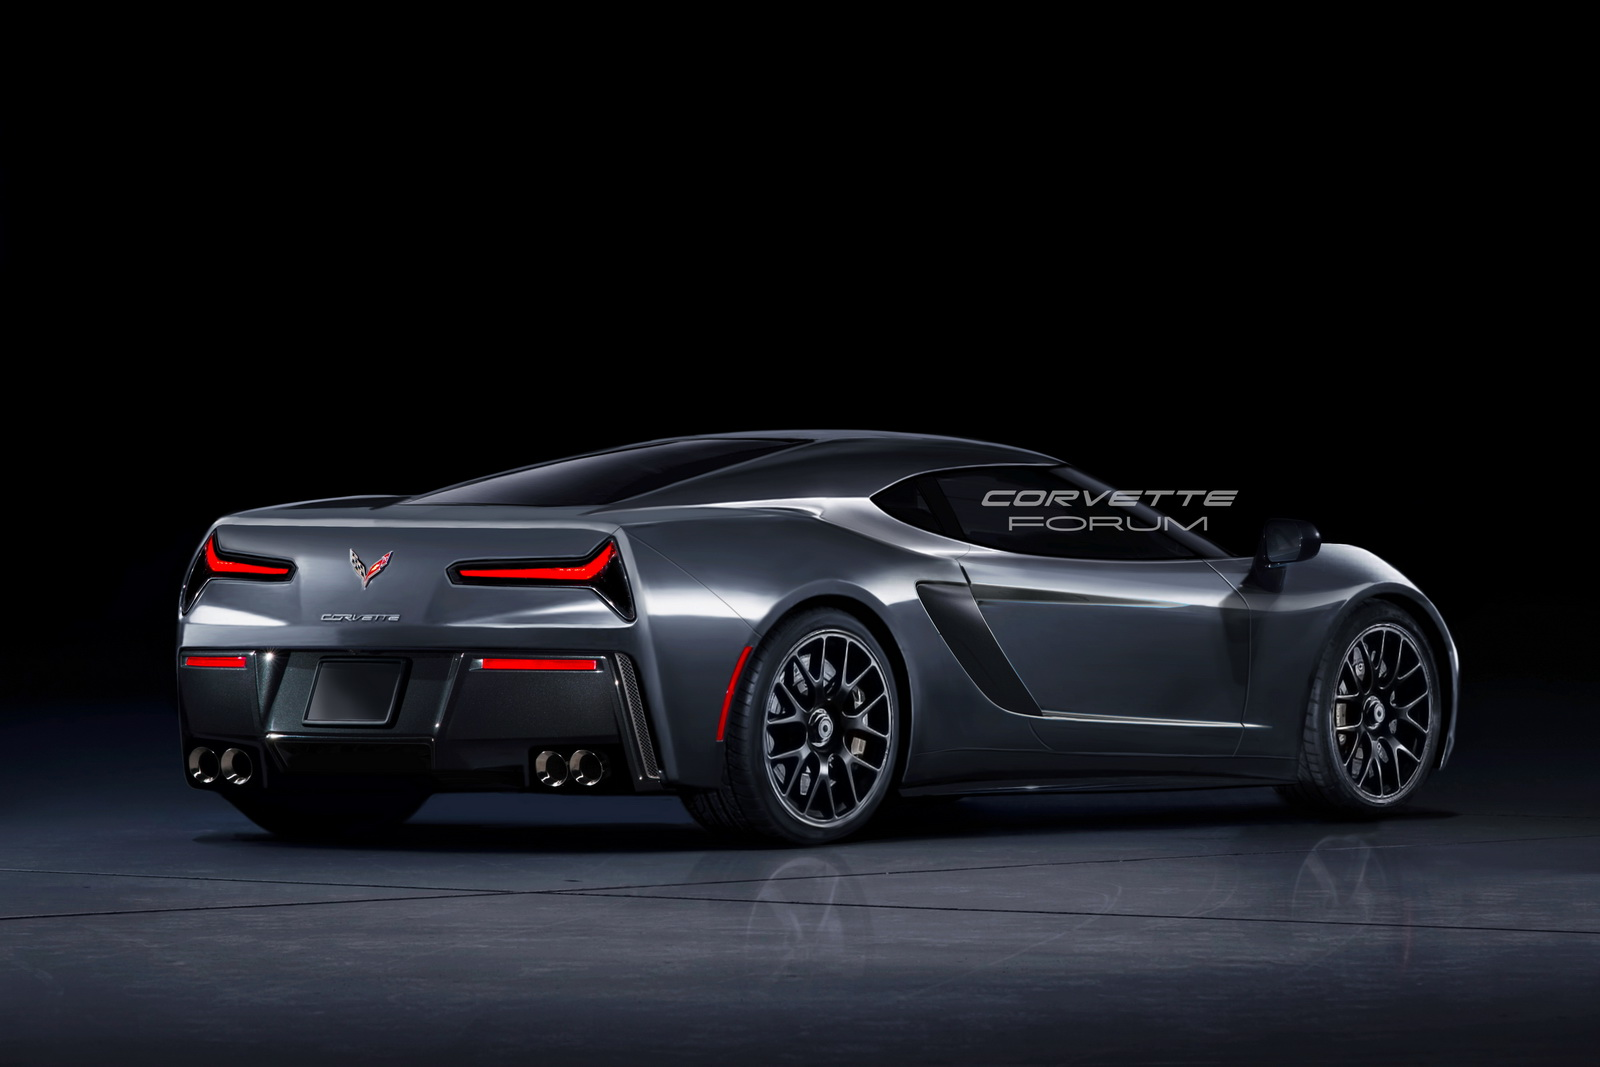 c8-zora-zr1-mid-engine-corvette-rendering-02.jpg